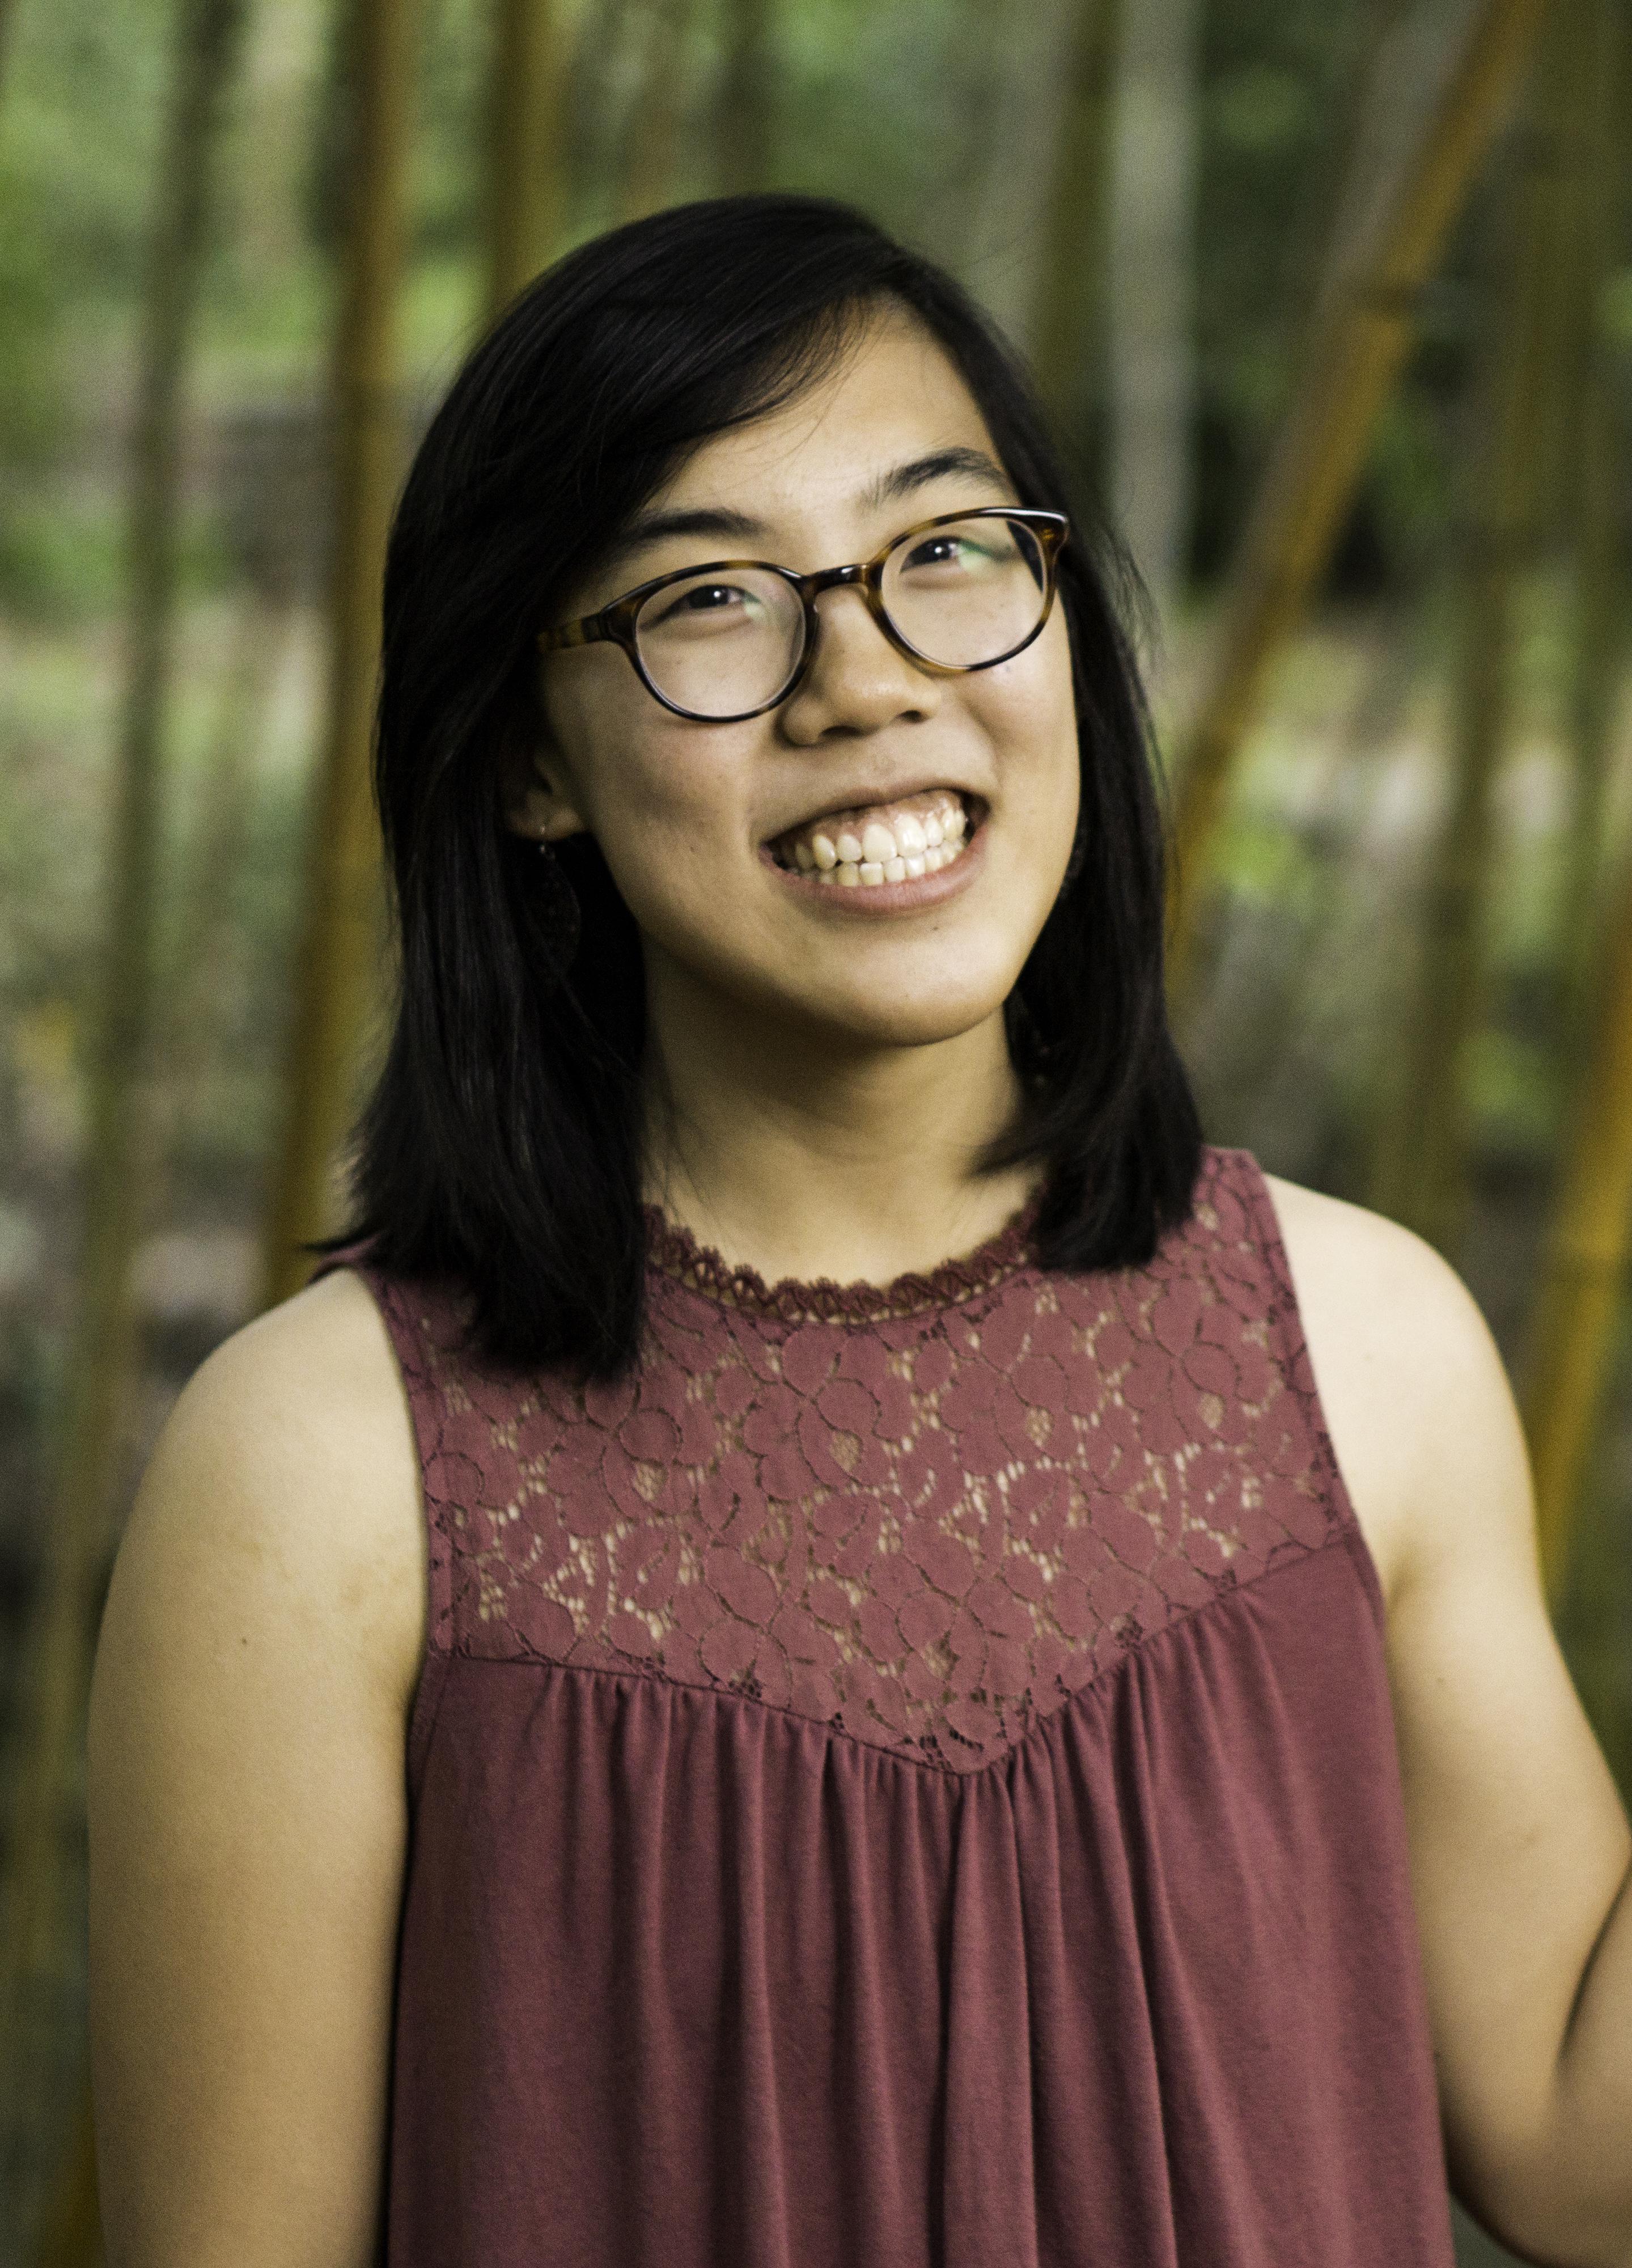 A headshot of Katelyn Liu.